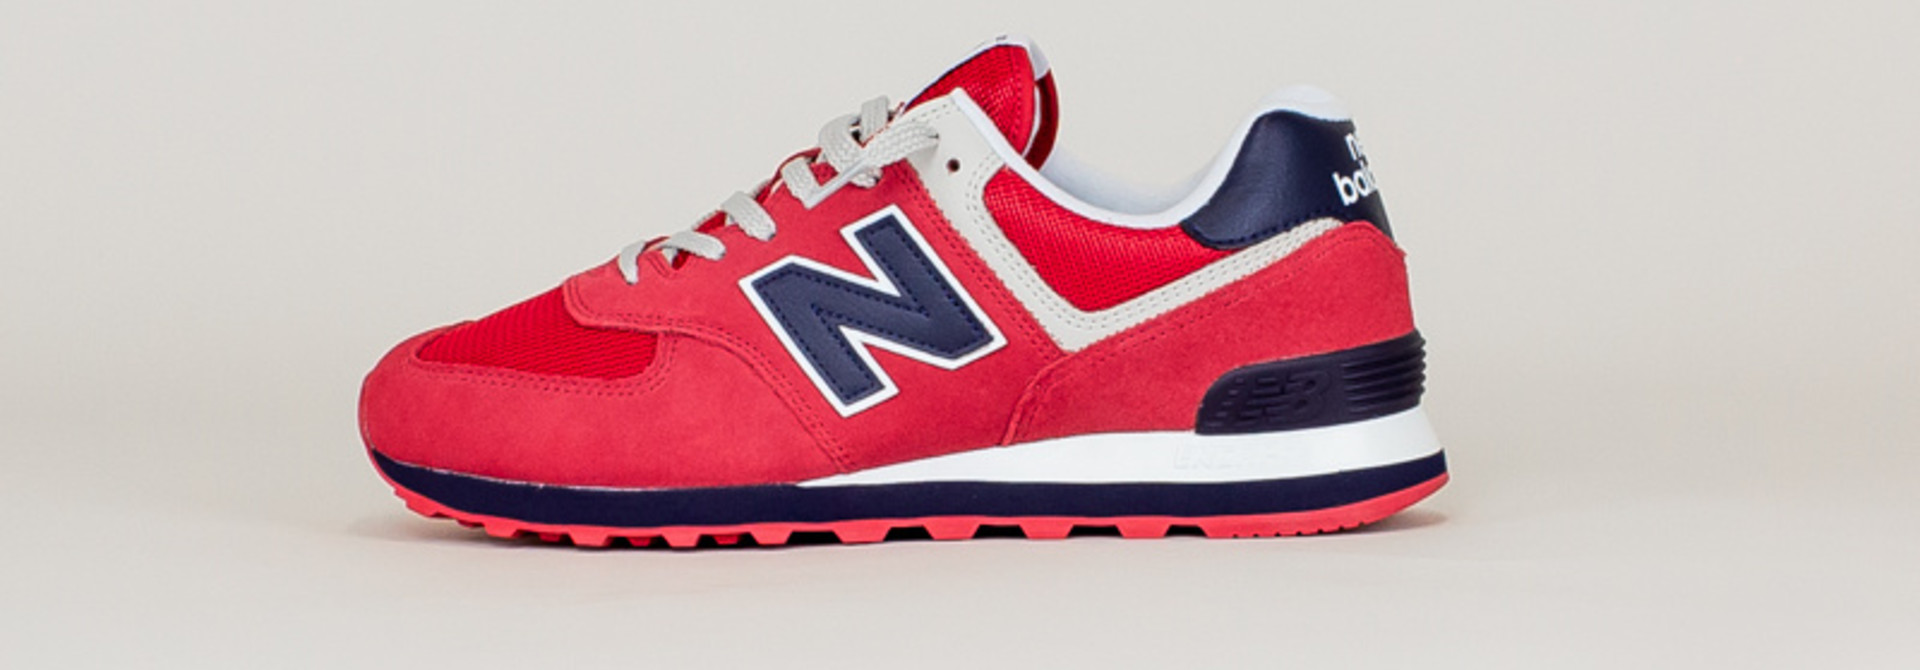 New Balance 574 MUE - Red/ Navy